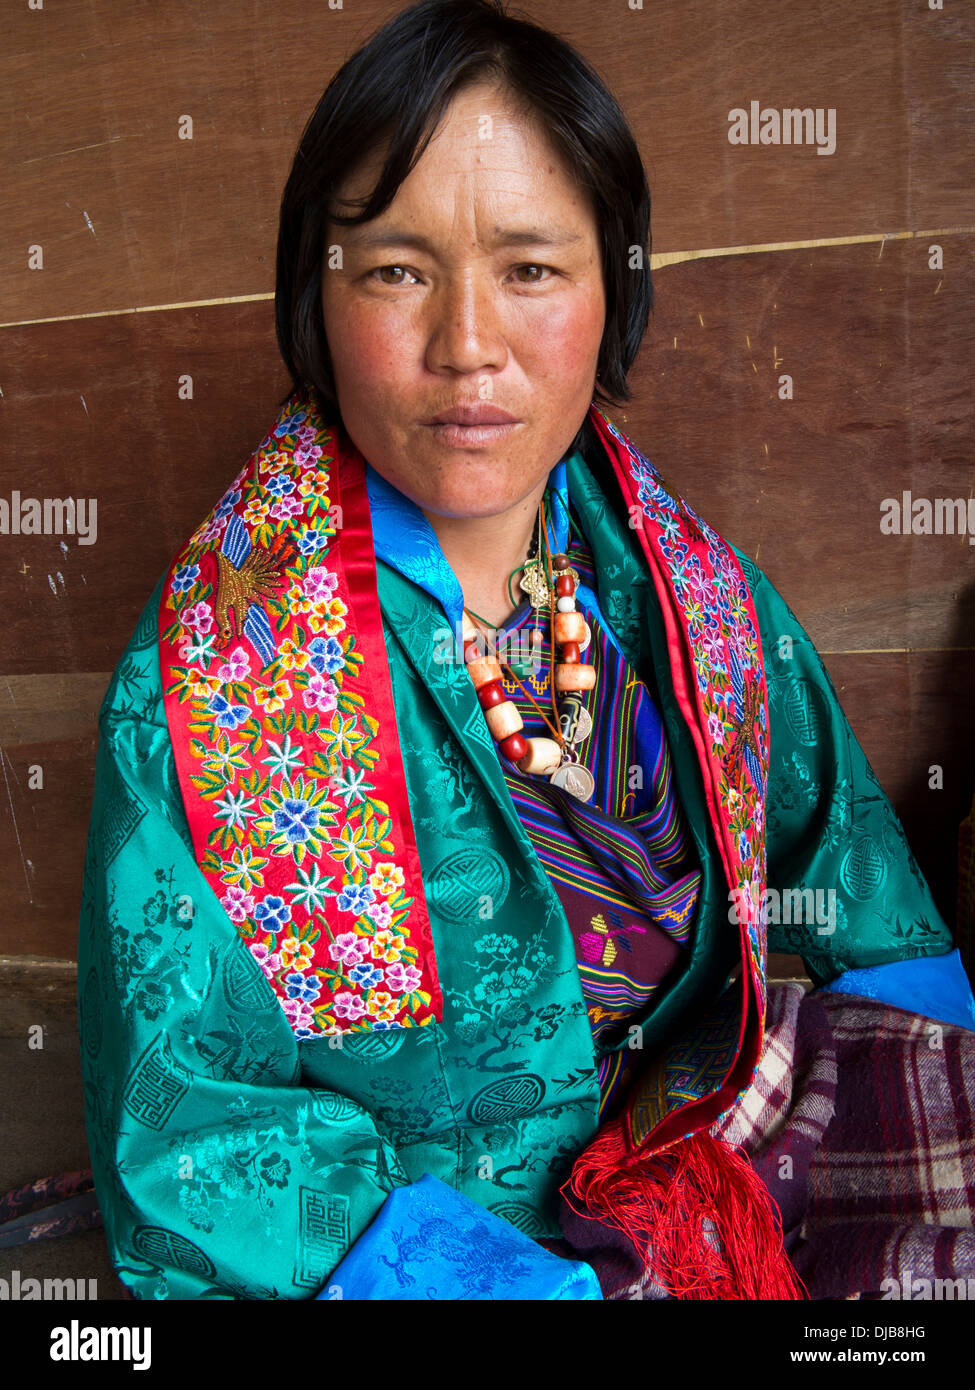 Bhutan, Phobjika, Gangte Goemba Tsechu, festival goer wearing traditional dress - Stock Image